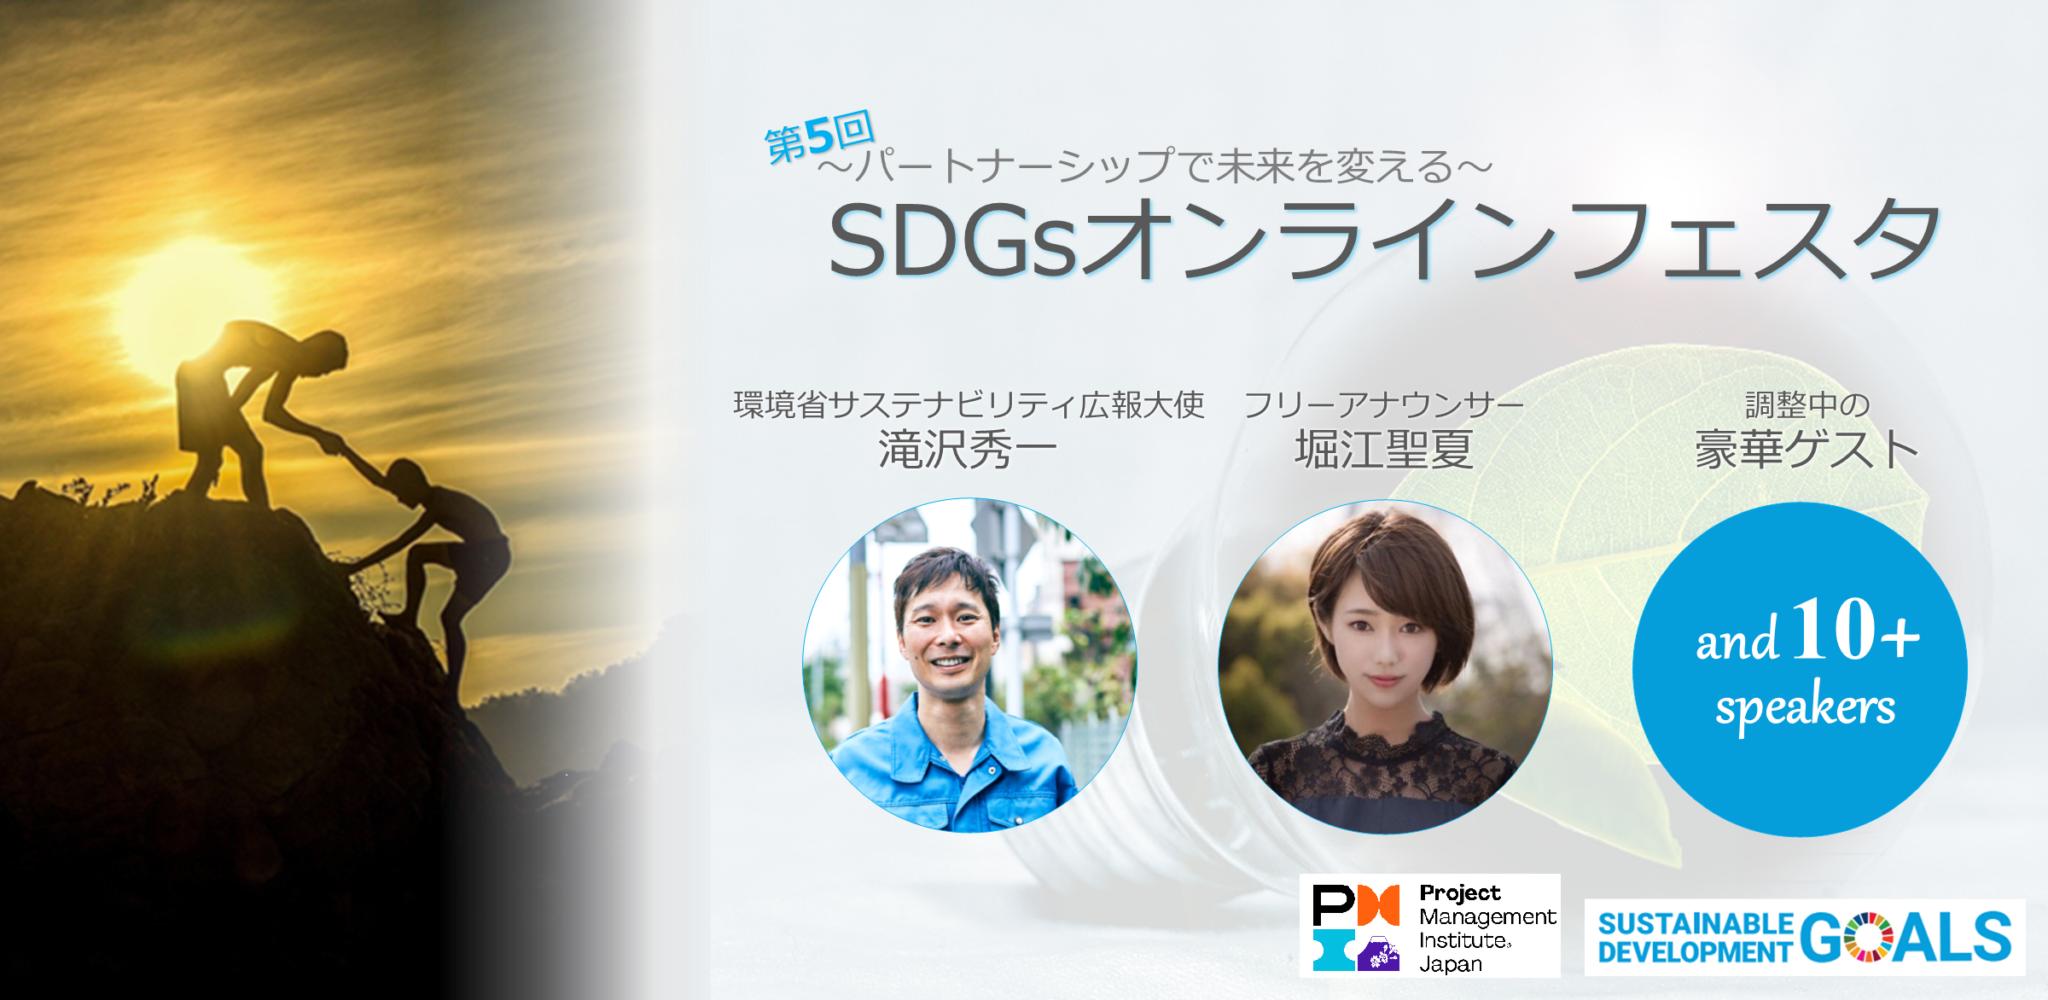 SDGsオンラインフェスタ